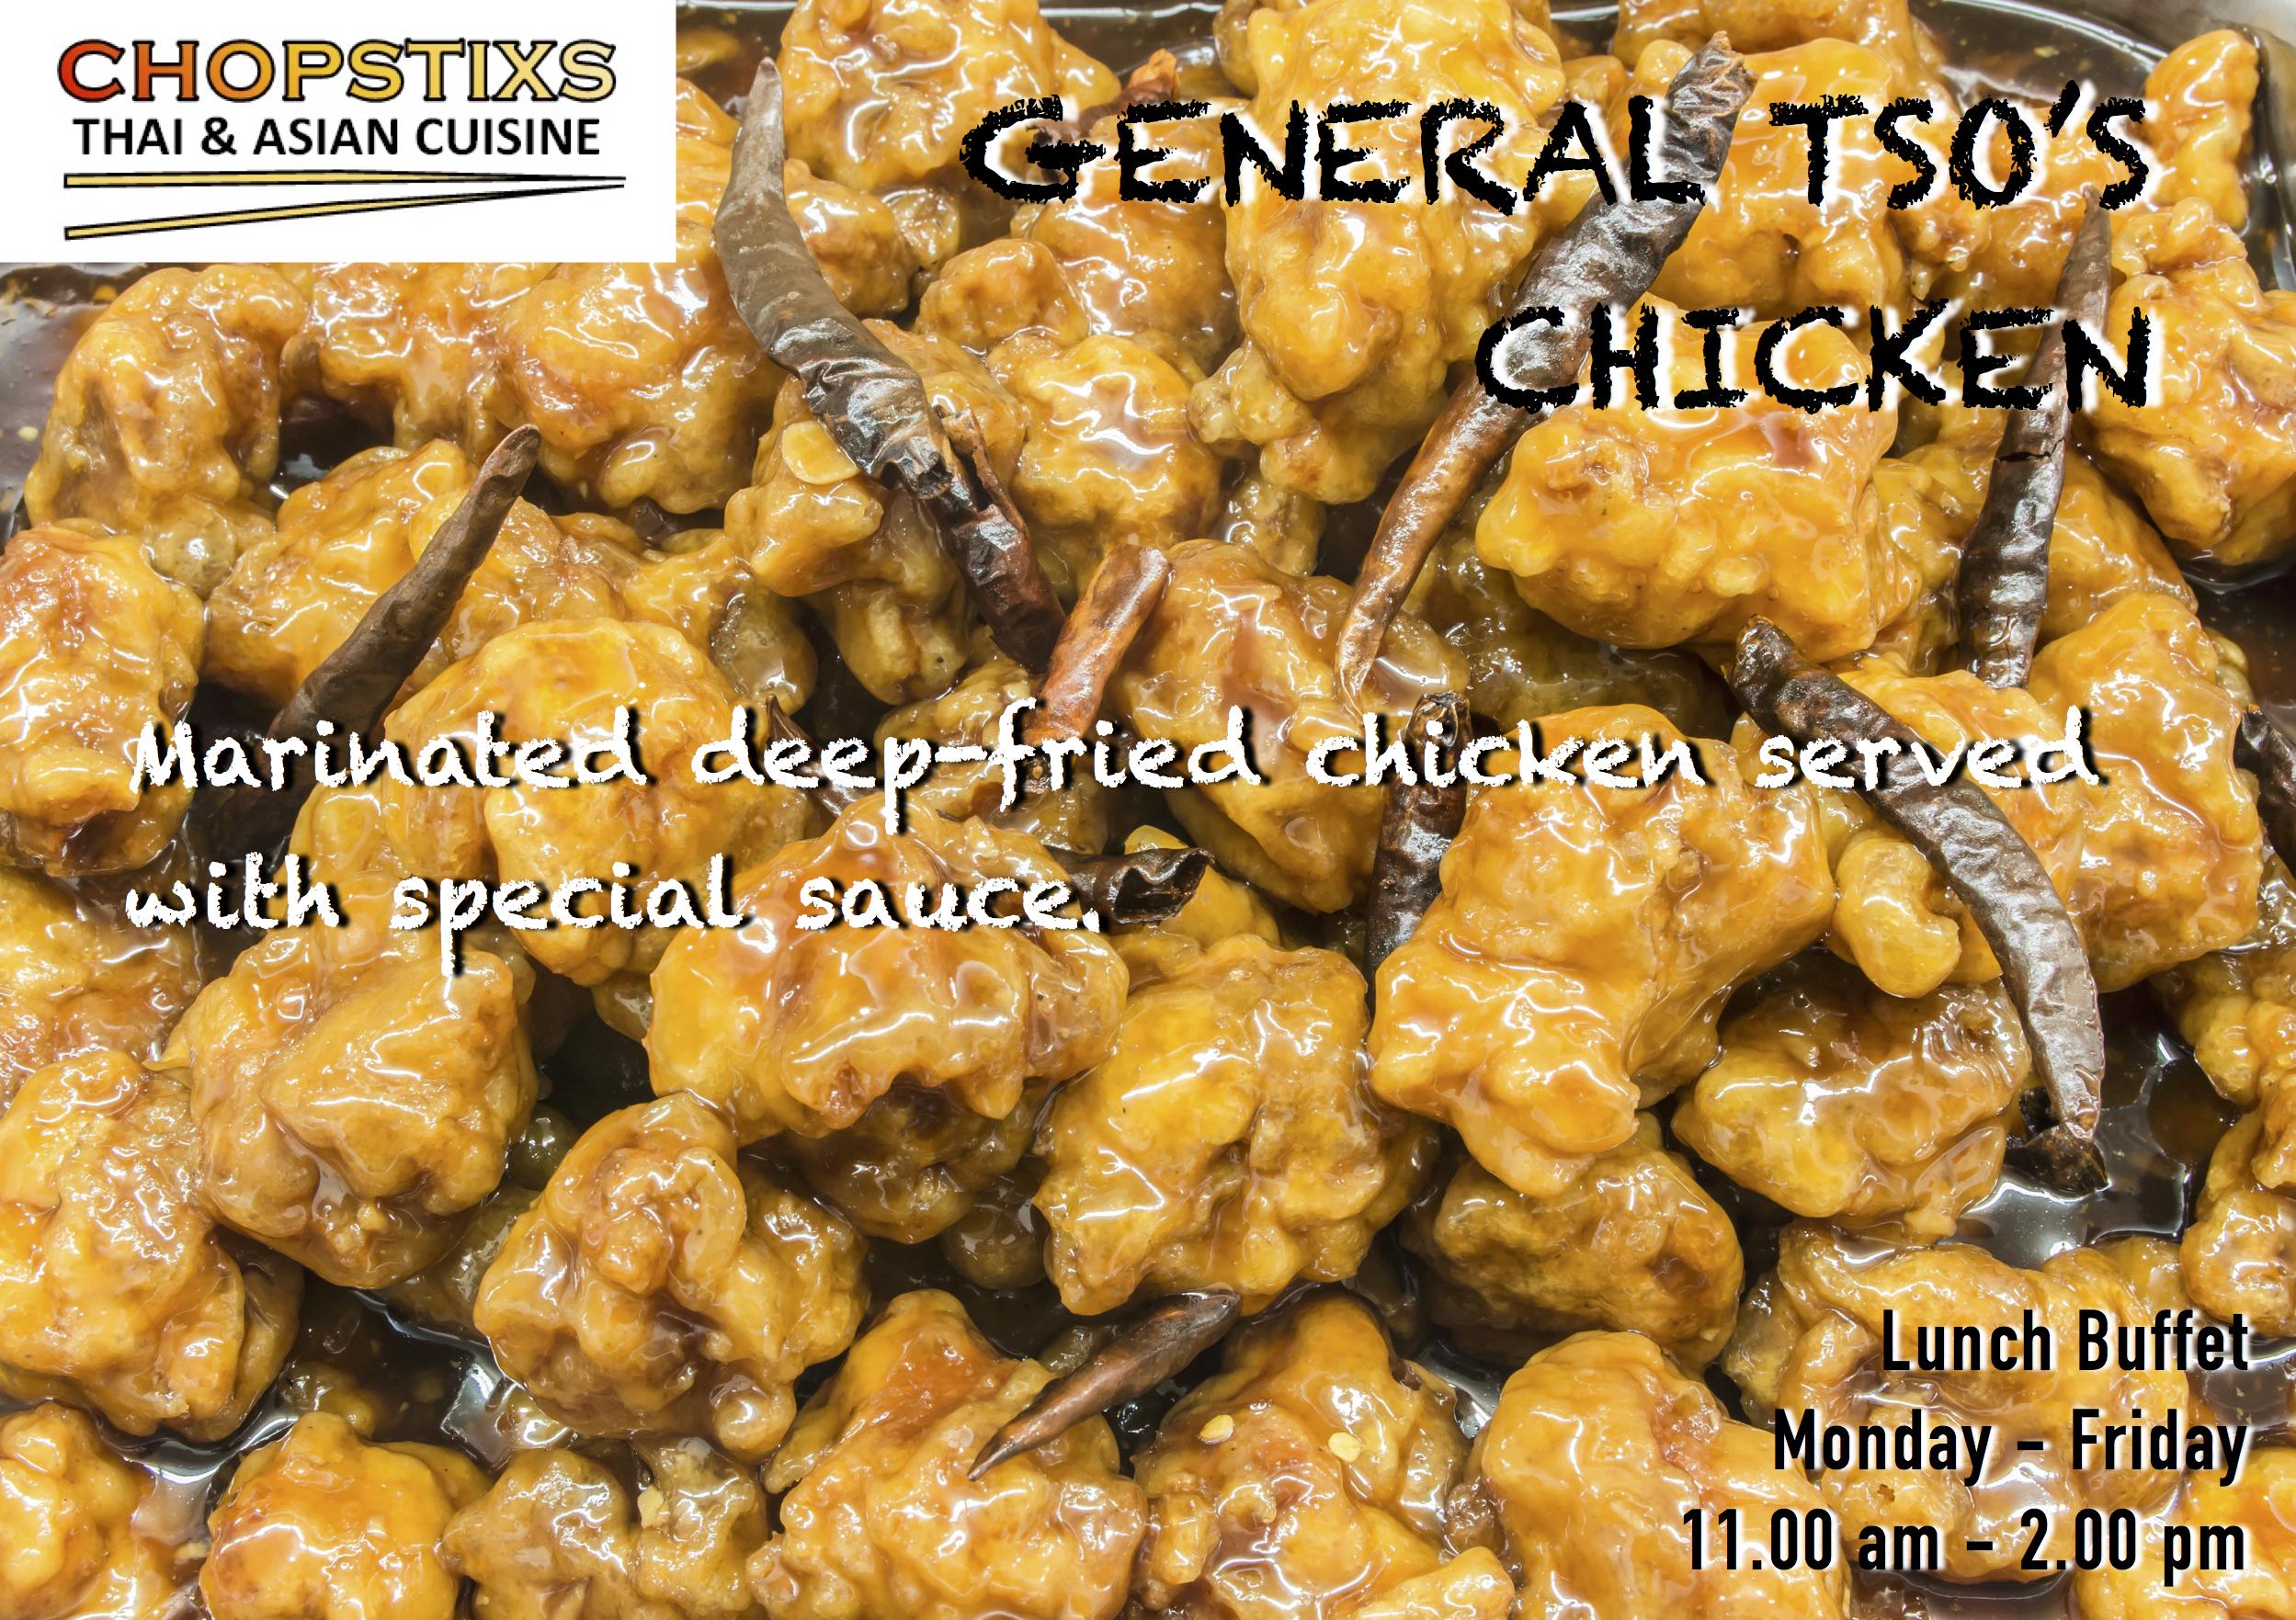 General Tsos Chicken Image